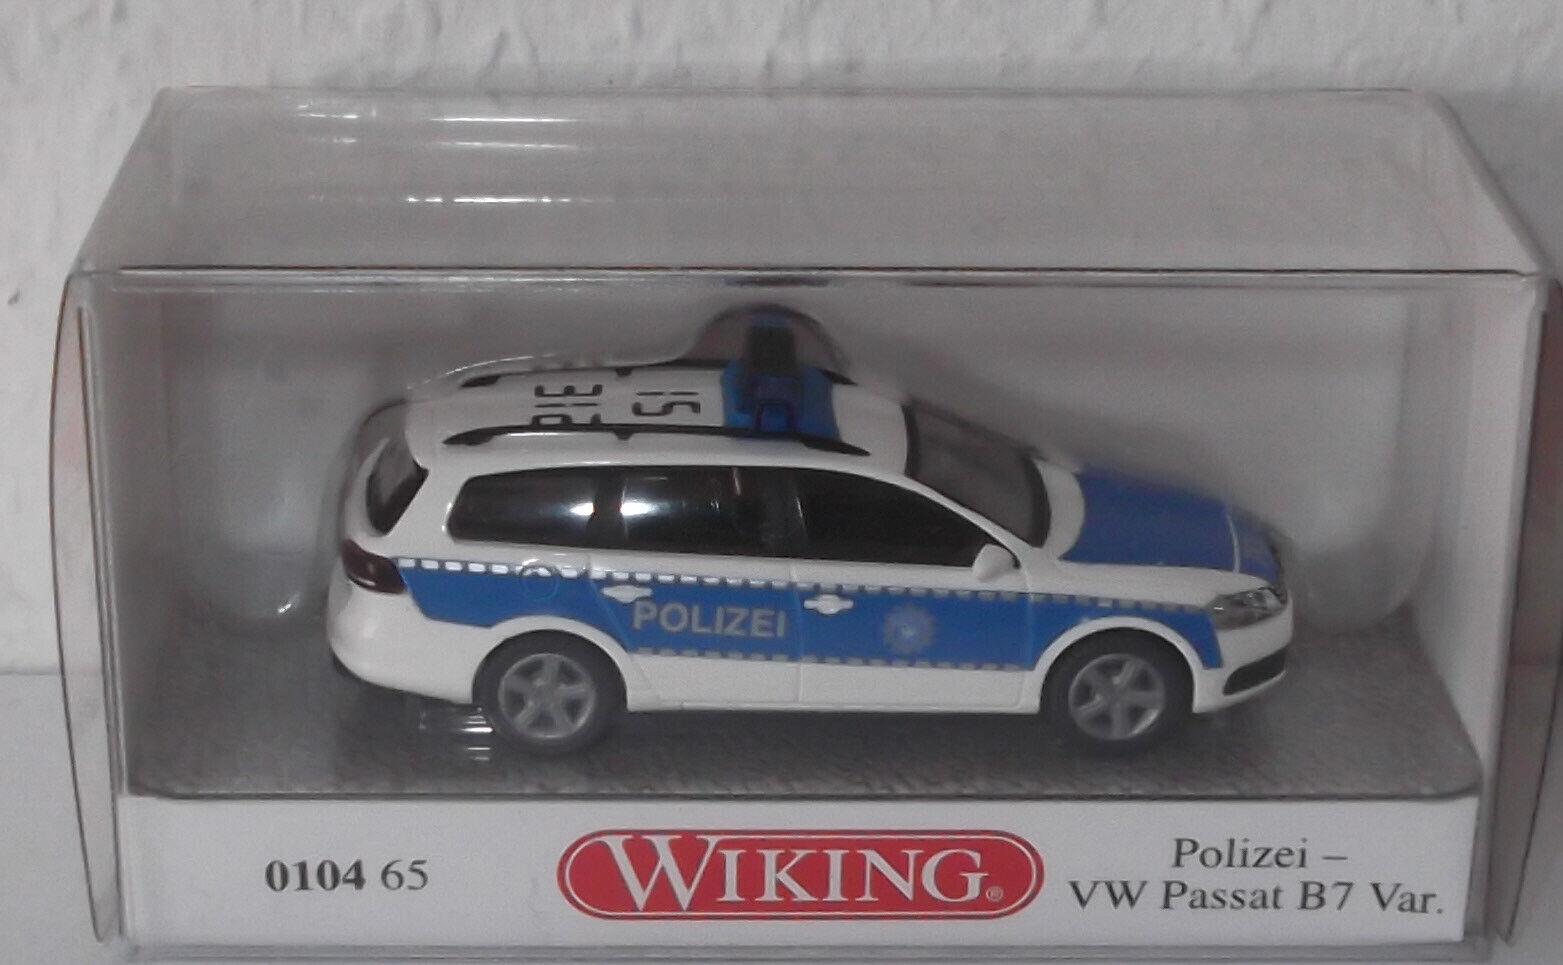 Wiking VW Passat Variant b7 Bianco Blu federali polizia n. 15-312 modello speciale